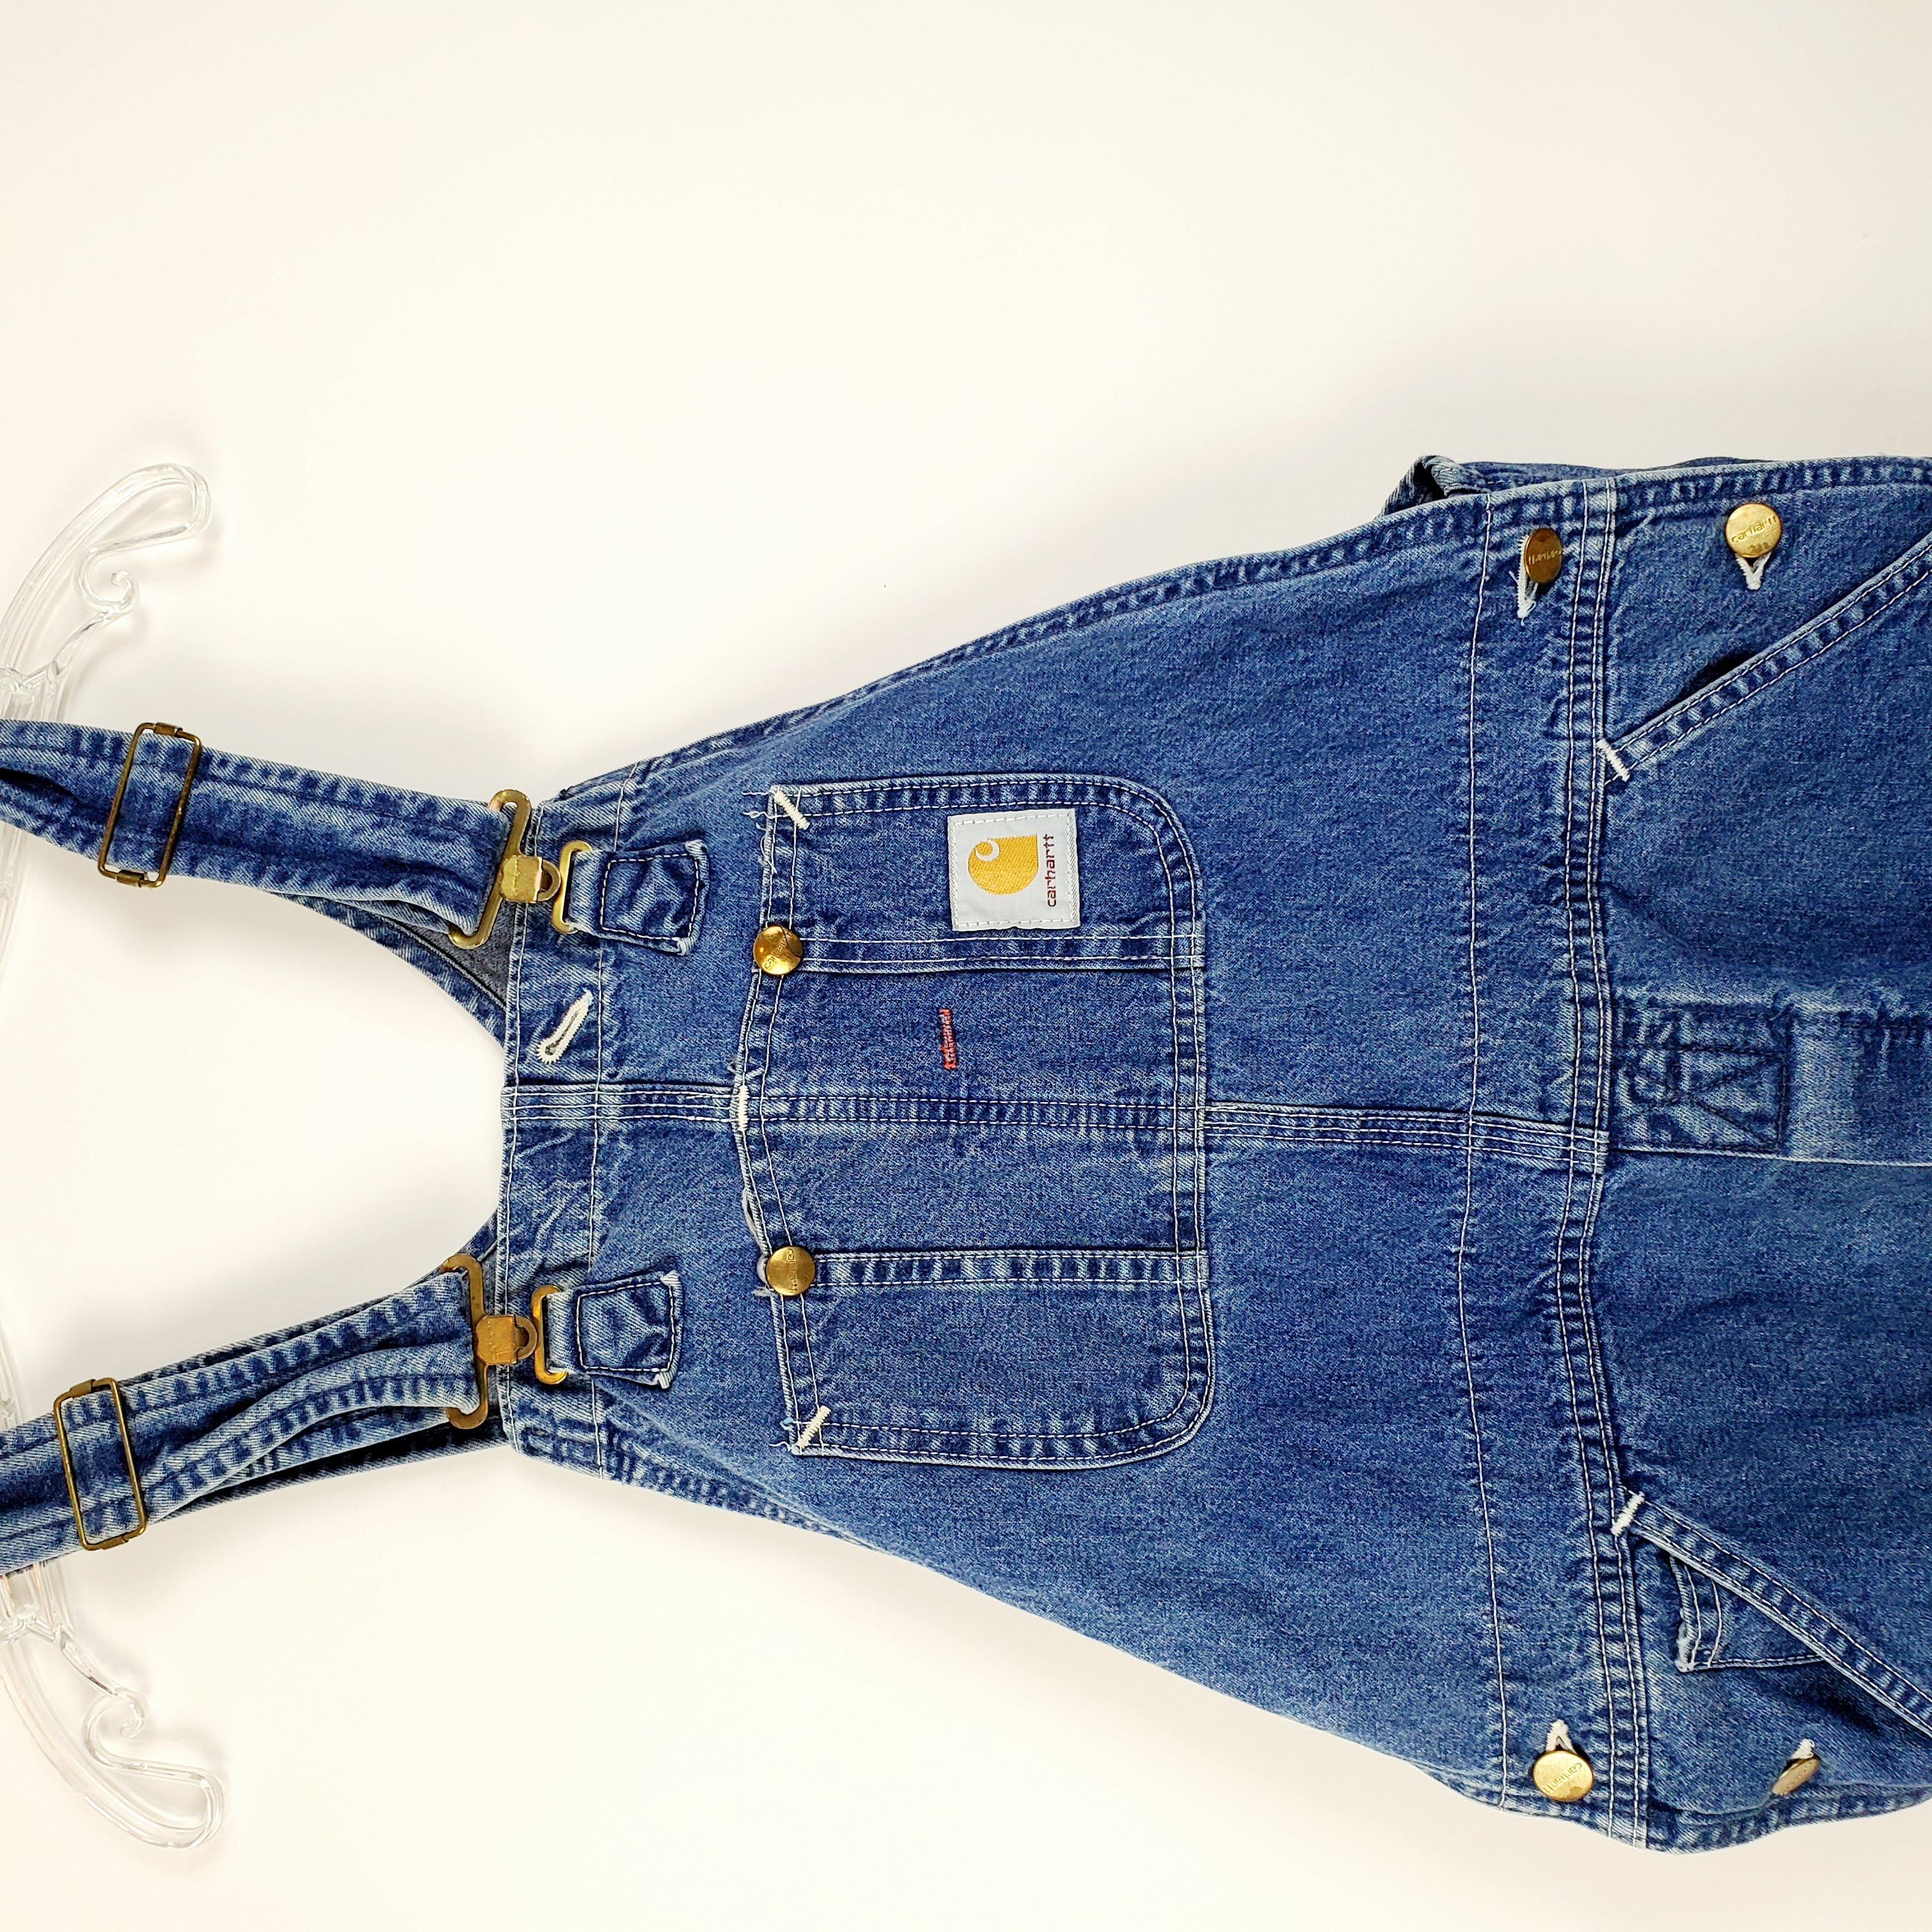 Vintage Carhartt Denim Work Dungarees Blue Bib Overalls Trousers M  L